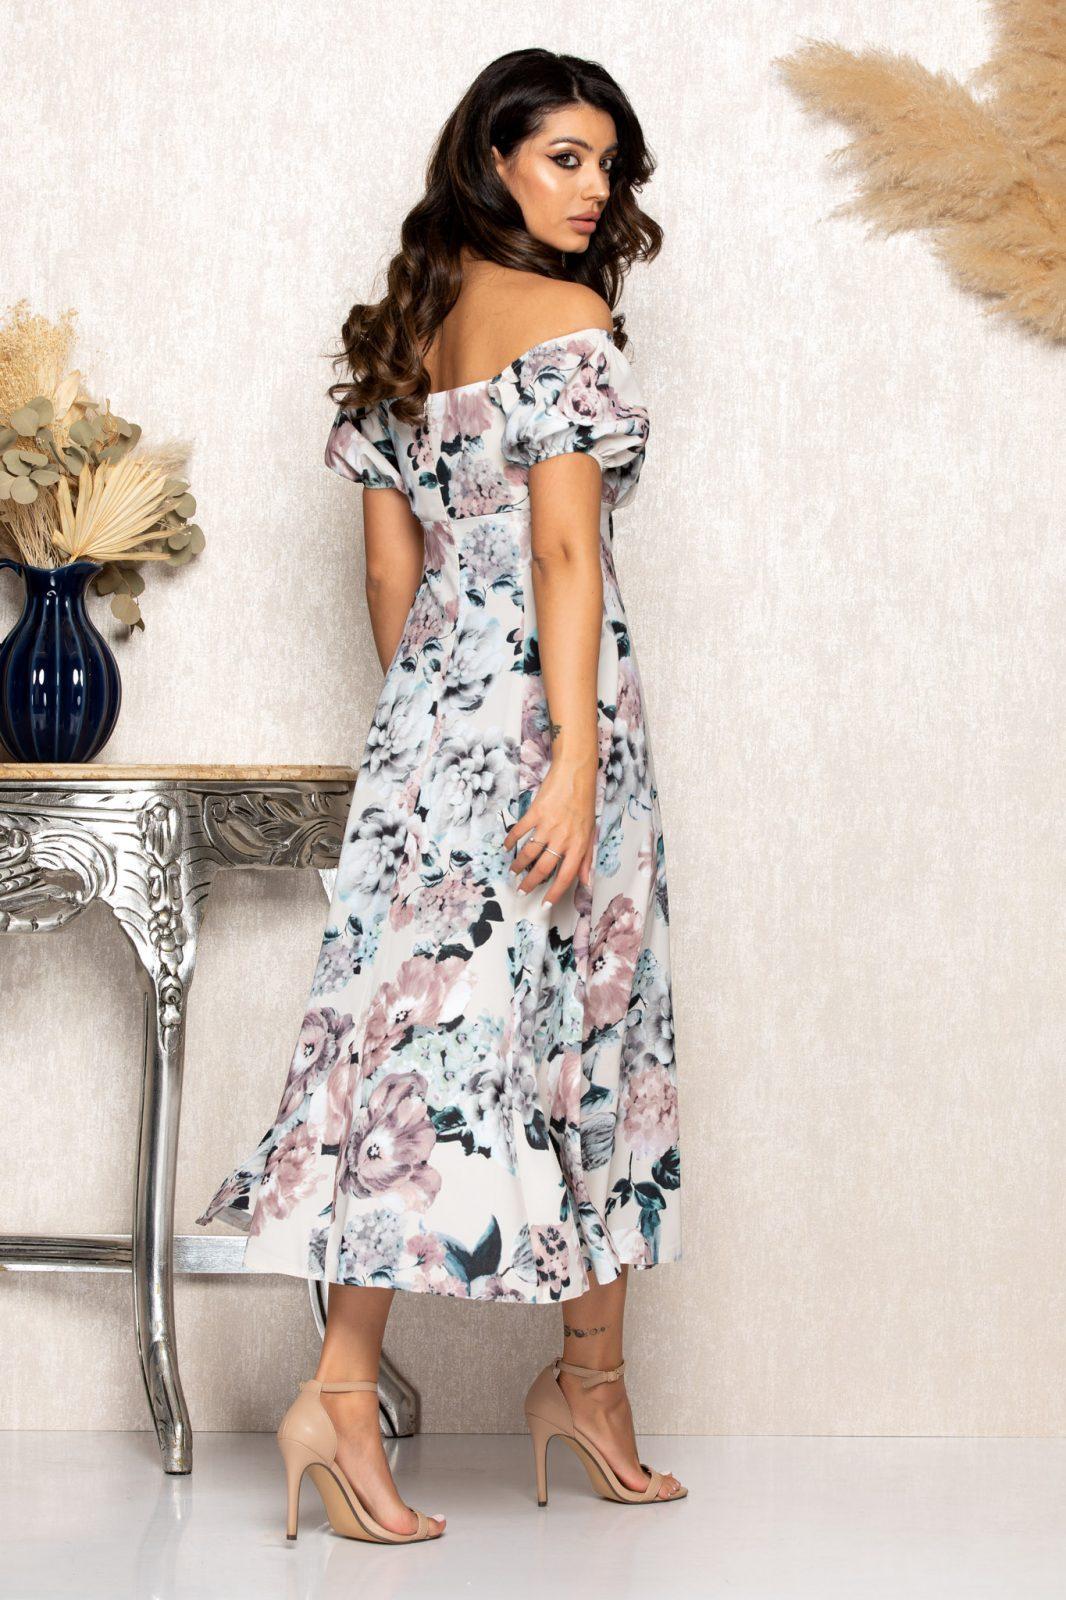 Nude Μίντι Φλοράλ Φόρεμα Rory B150 2